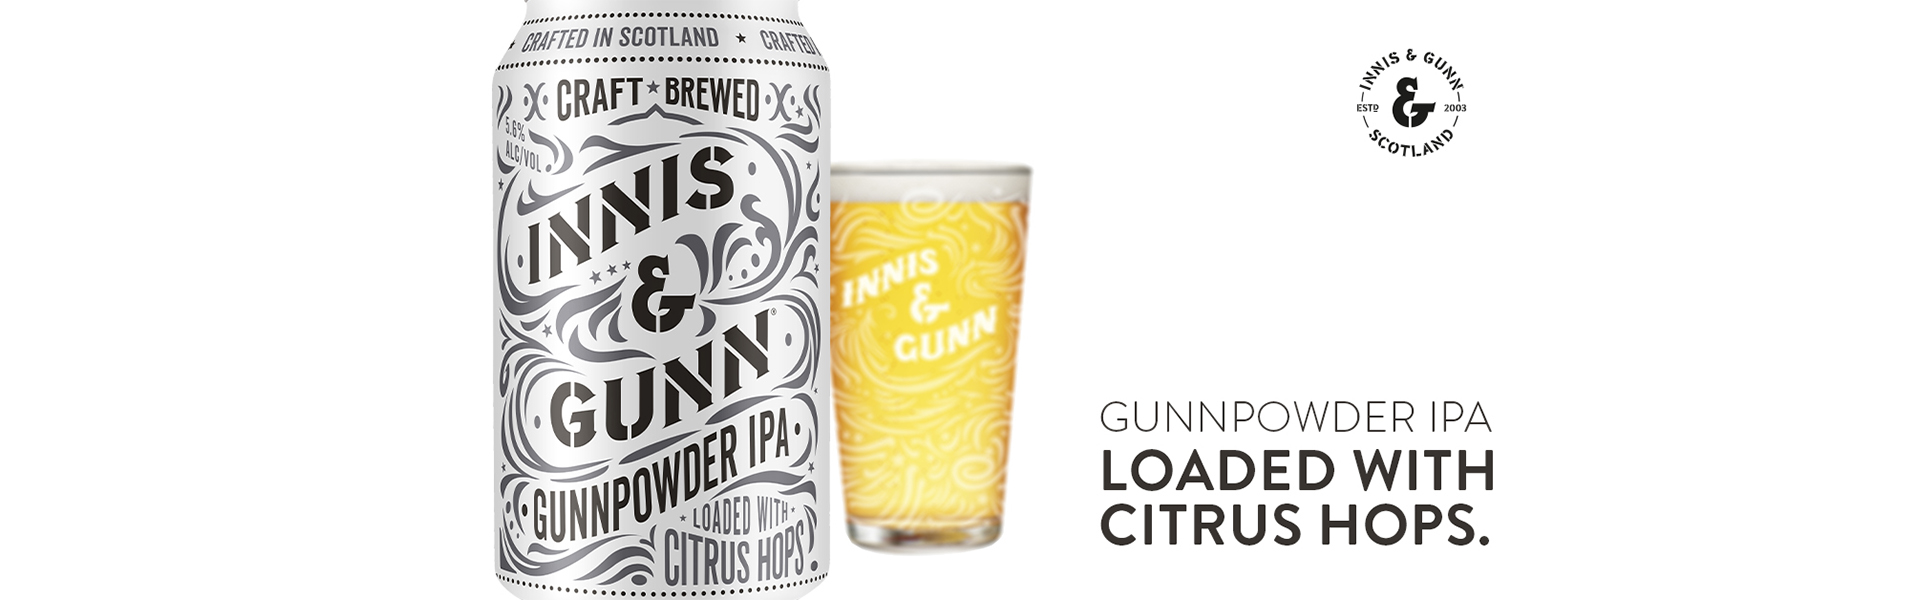 Boom! Innis & Gunn Gunnpowder IPA – nu i systembolagets fasta sortment.